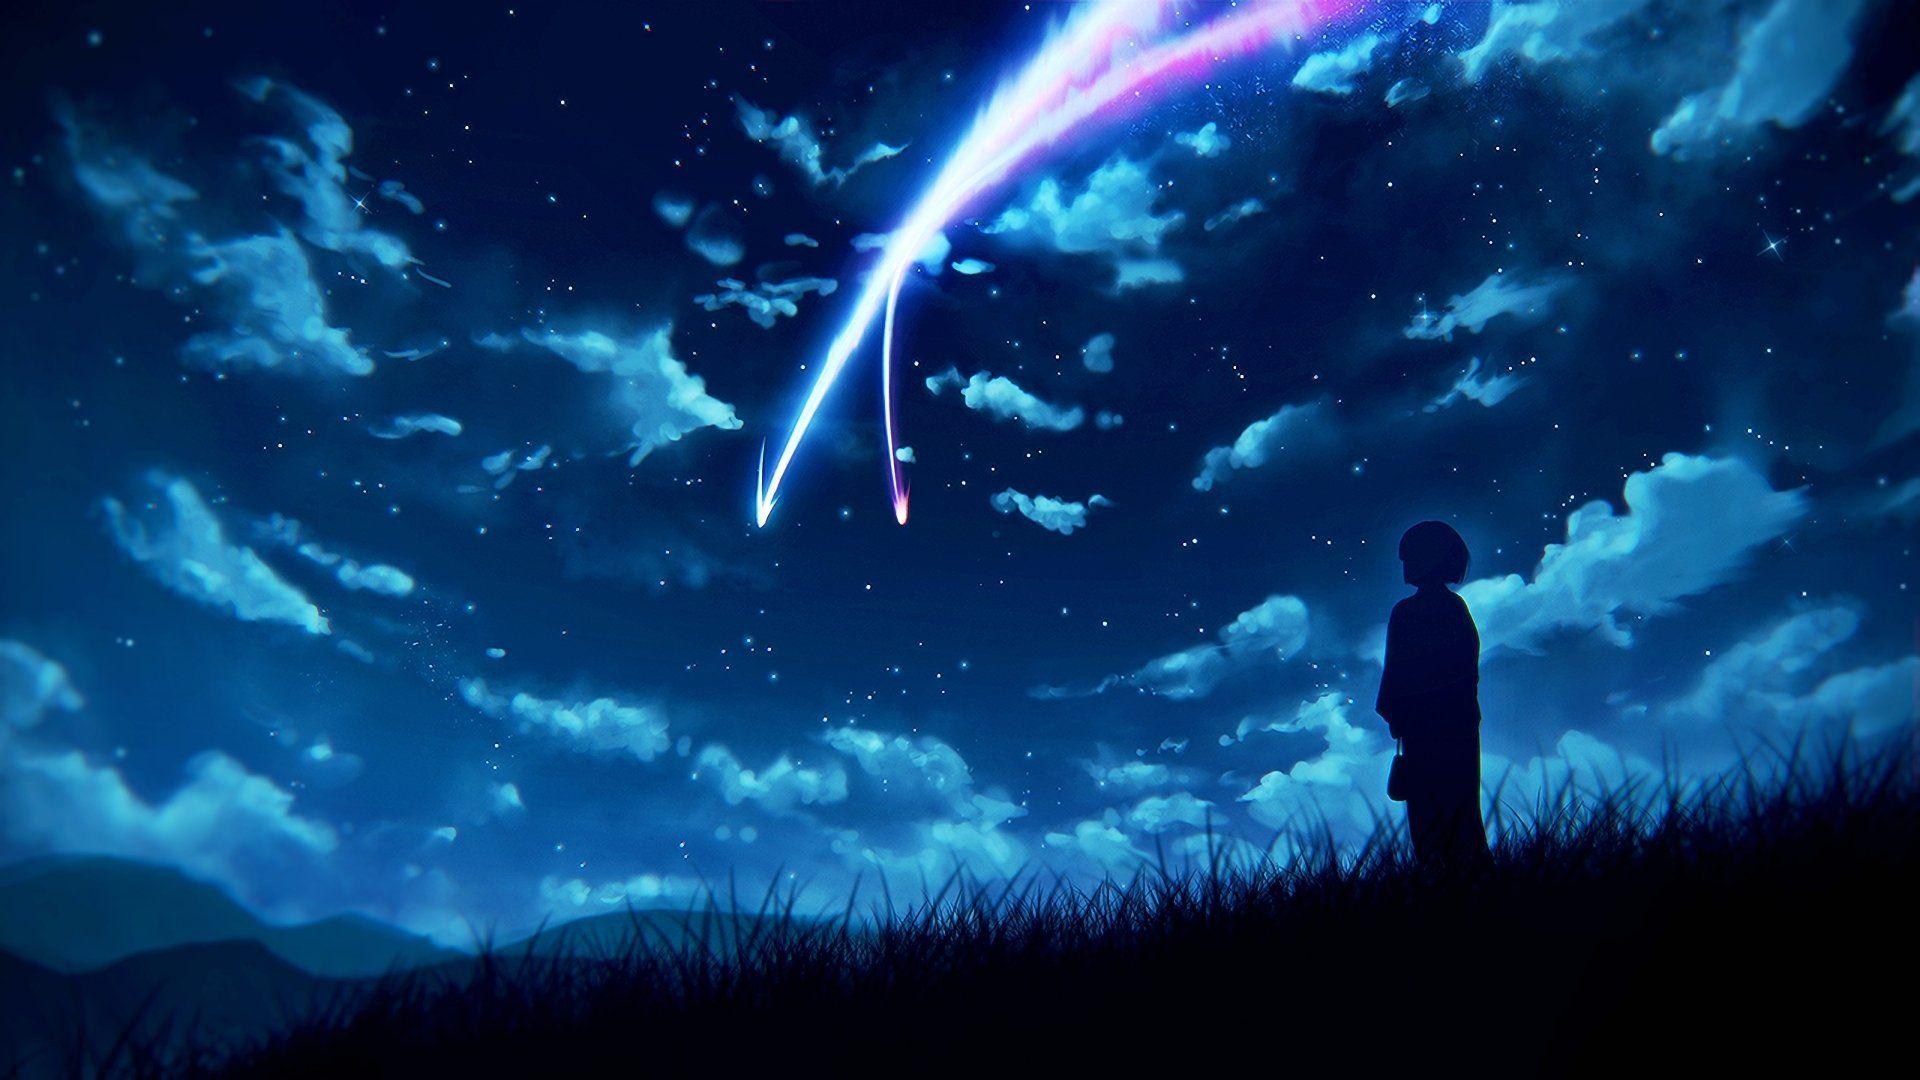 Anime Your Name Mitsuha Miyamizu Kimi No Na Wa Wallpaper In 2020 Kimi No Na Wa Wallpaper Anime Backgrounds Wallpapers Scenery Wallpaper